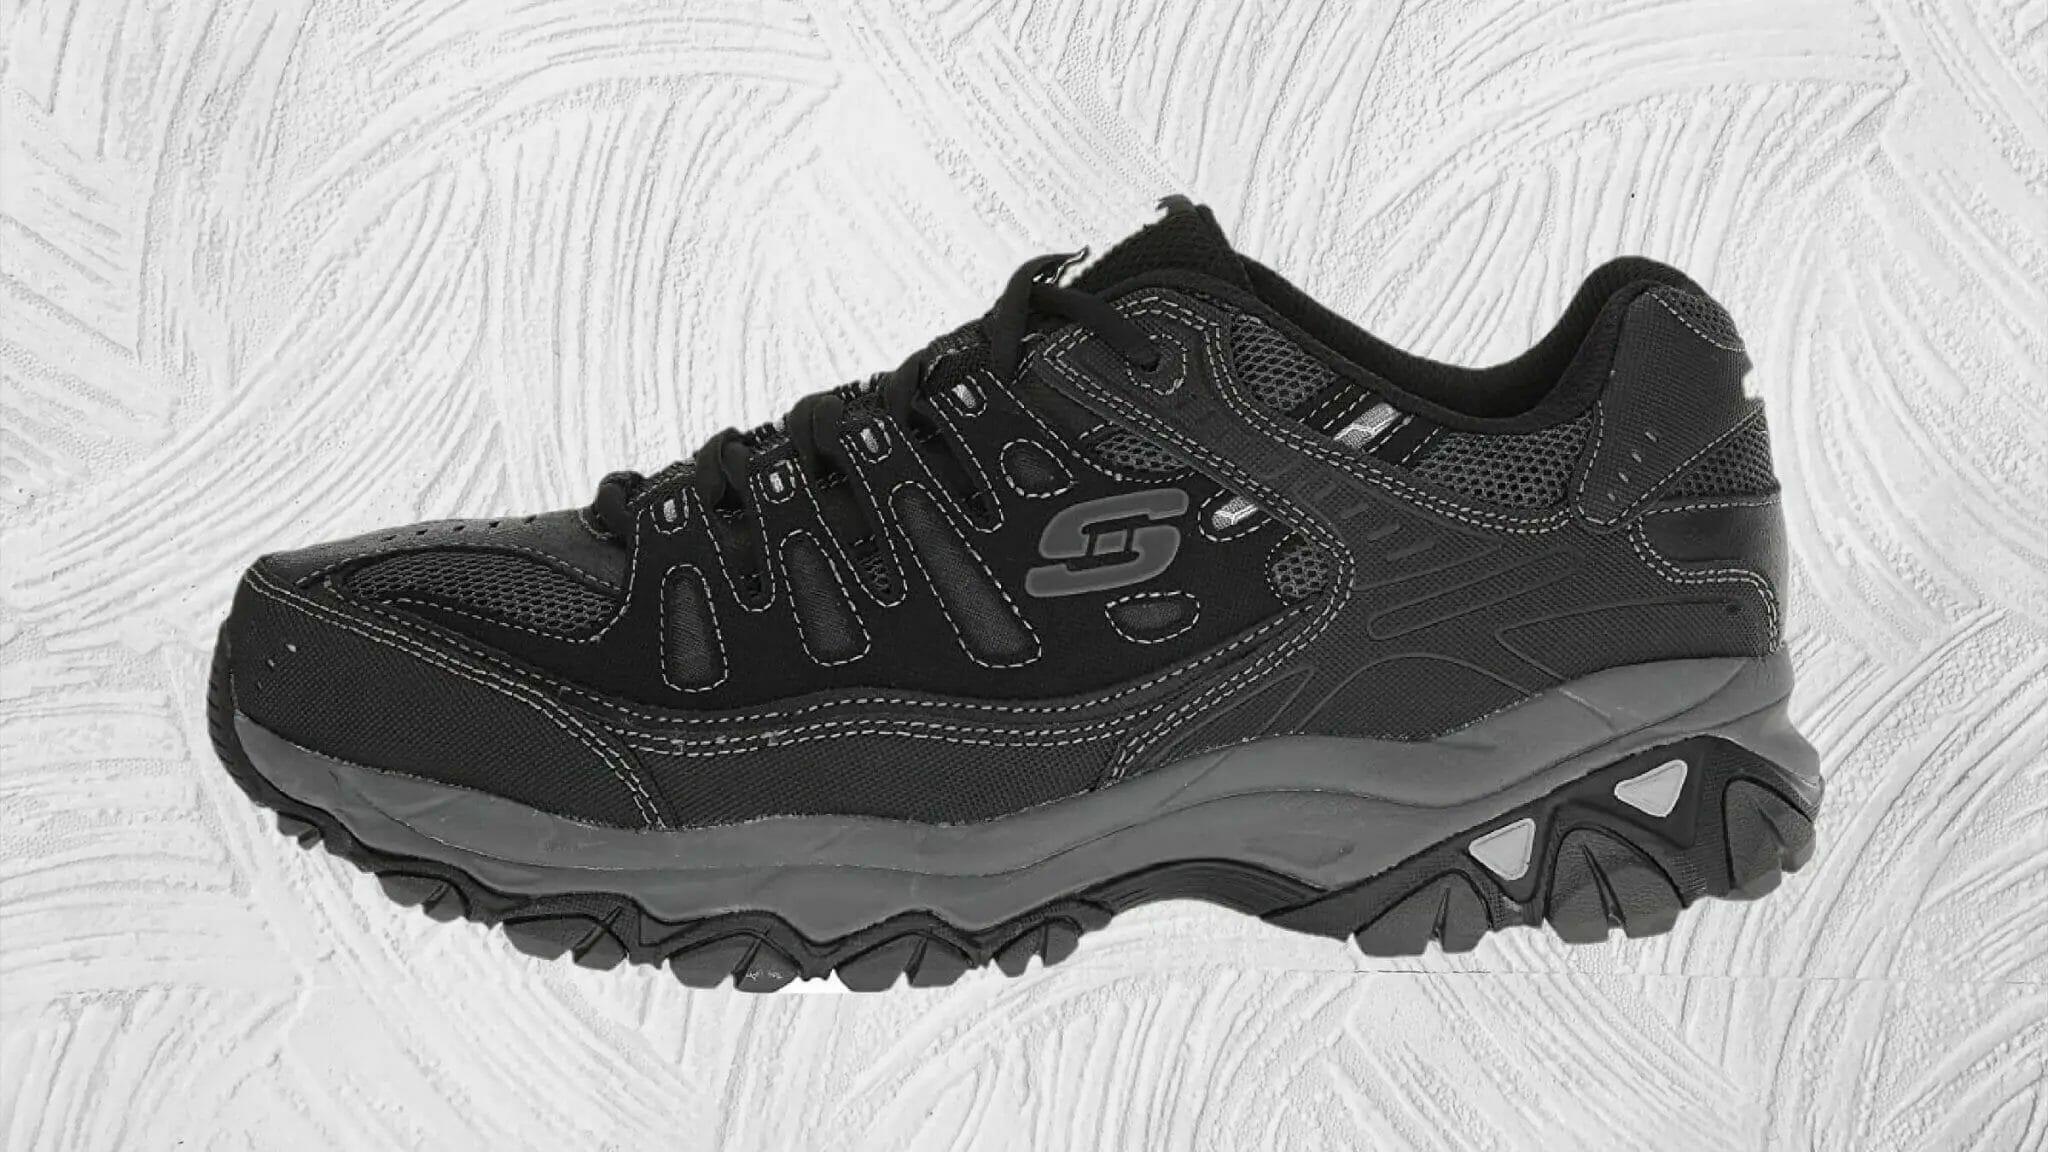 Skechers afterburn Memory fit shoe with memory foam insole